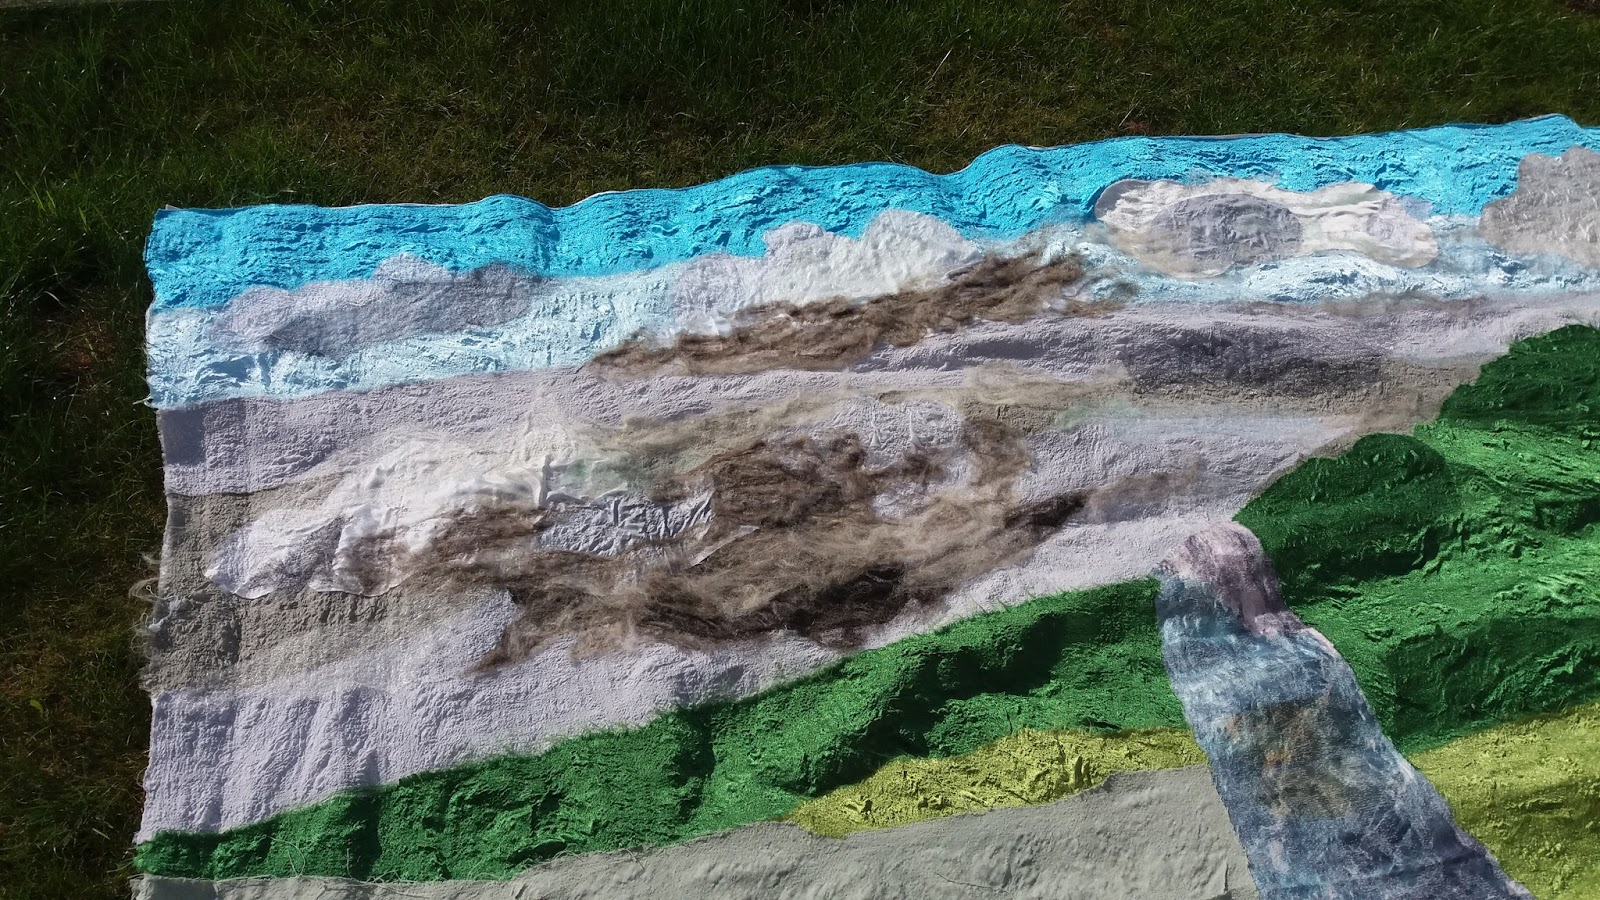 Van alles wat un peu de tout wandkleed 2 tapis mural 2 for 9 11 mural van